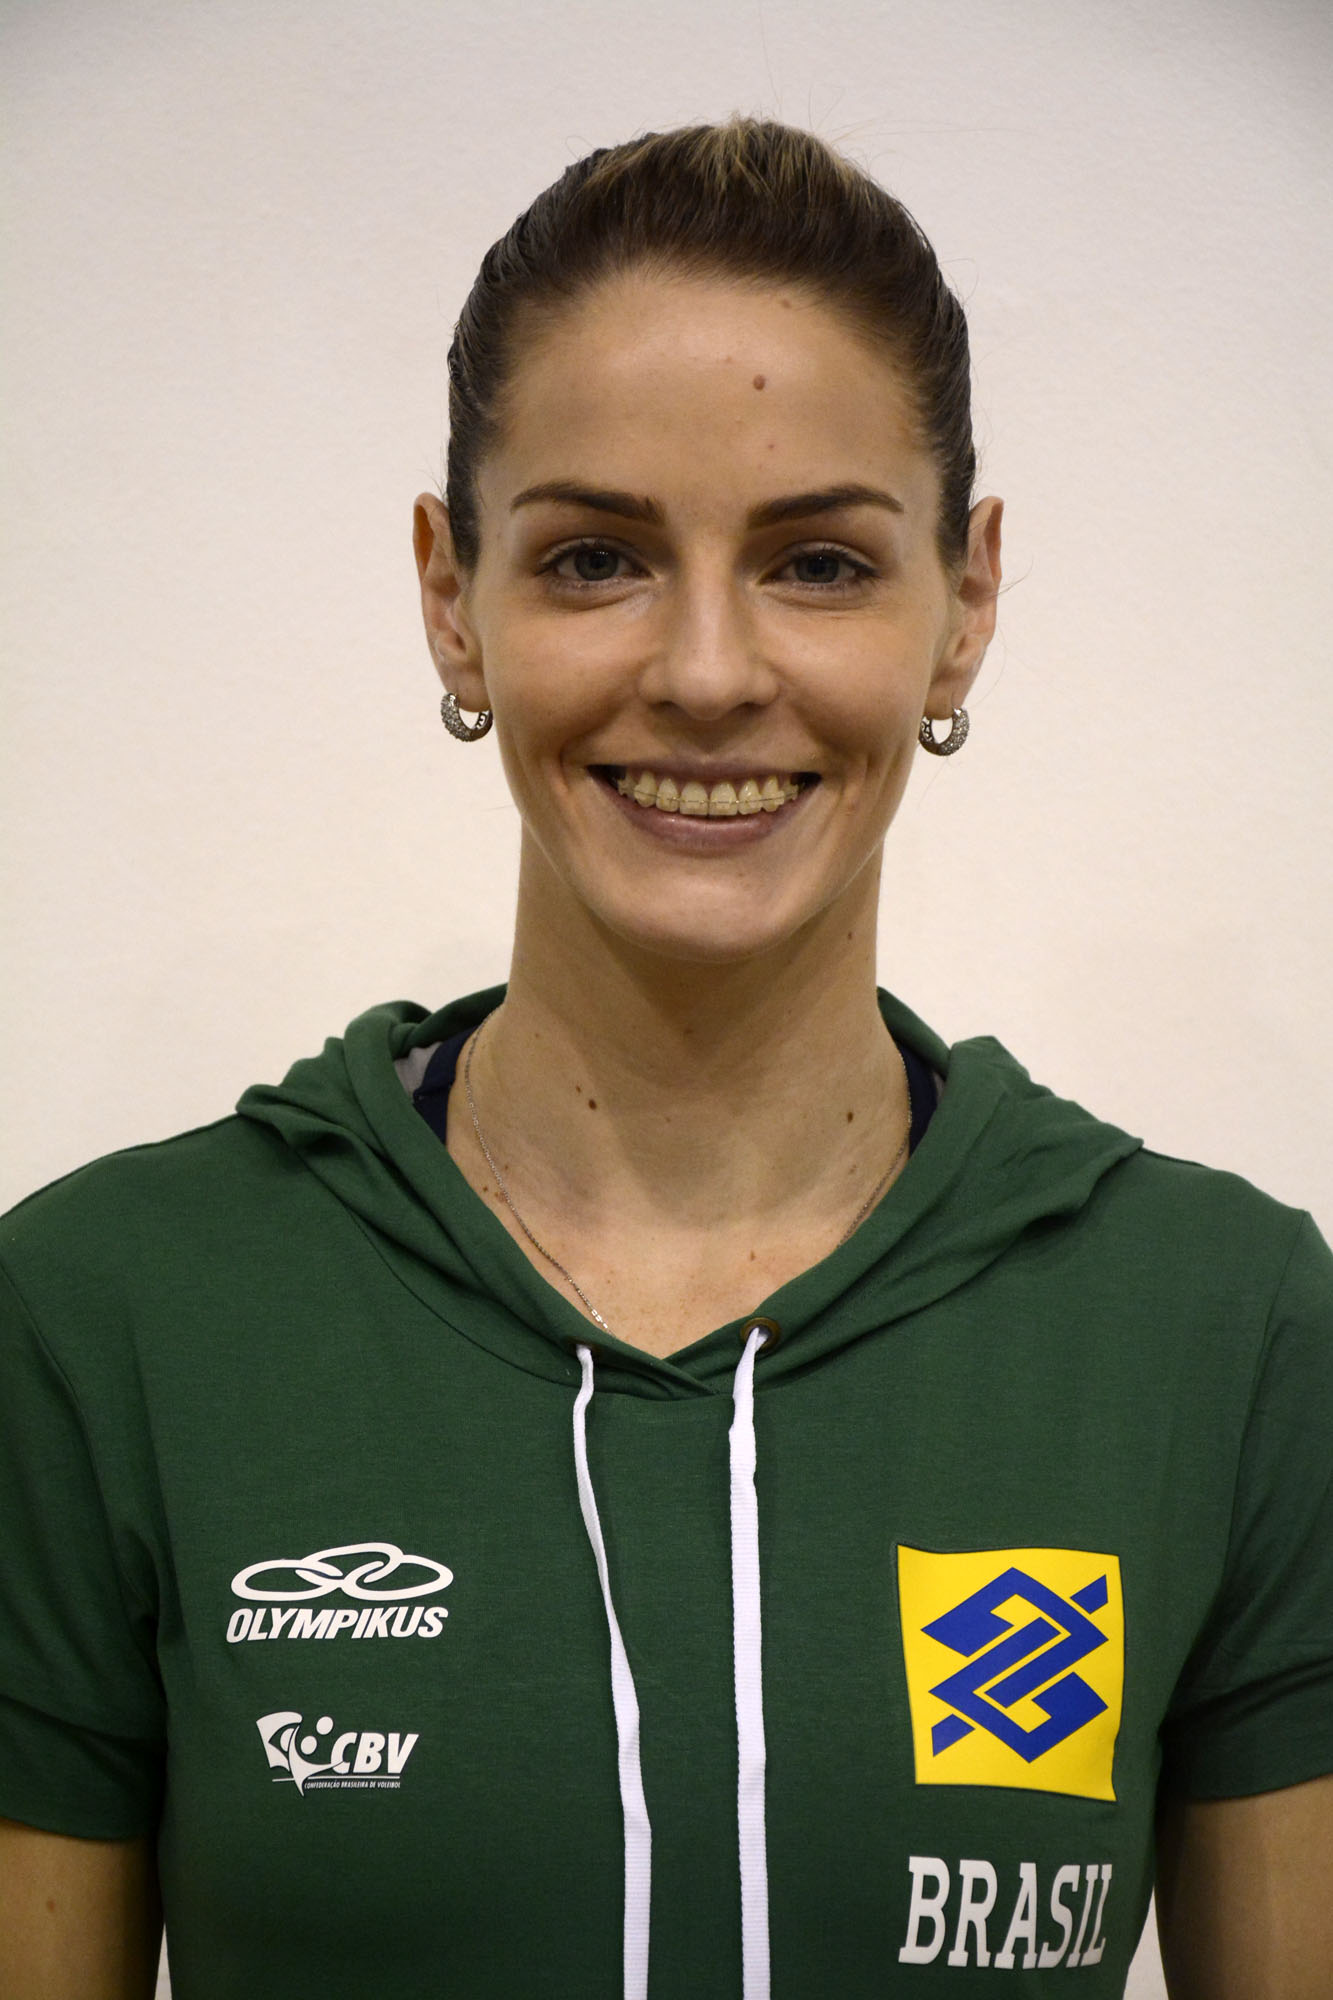 Suelle Oliveira